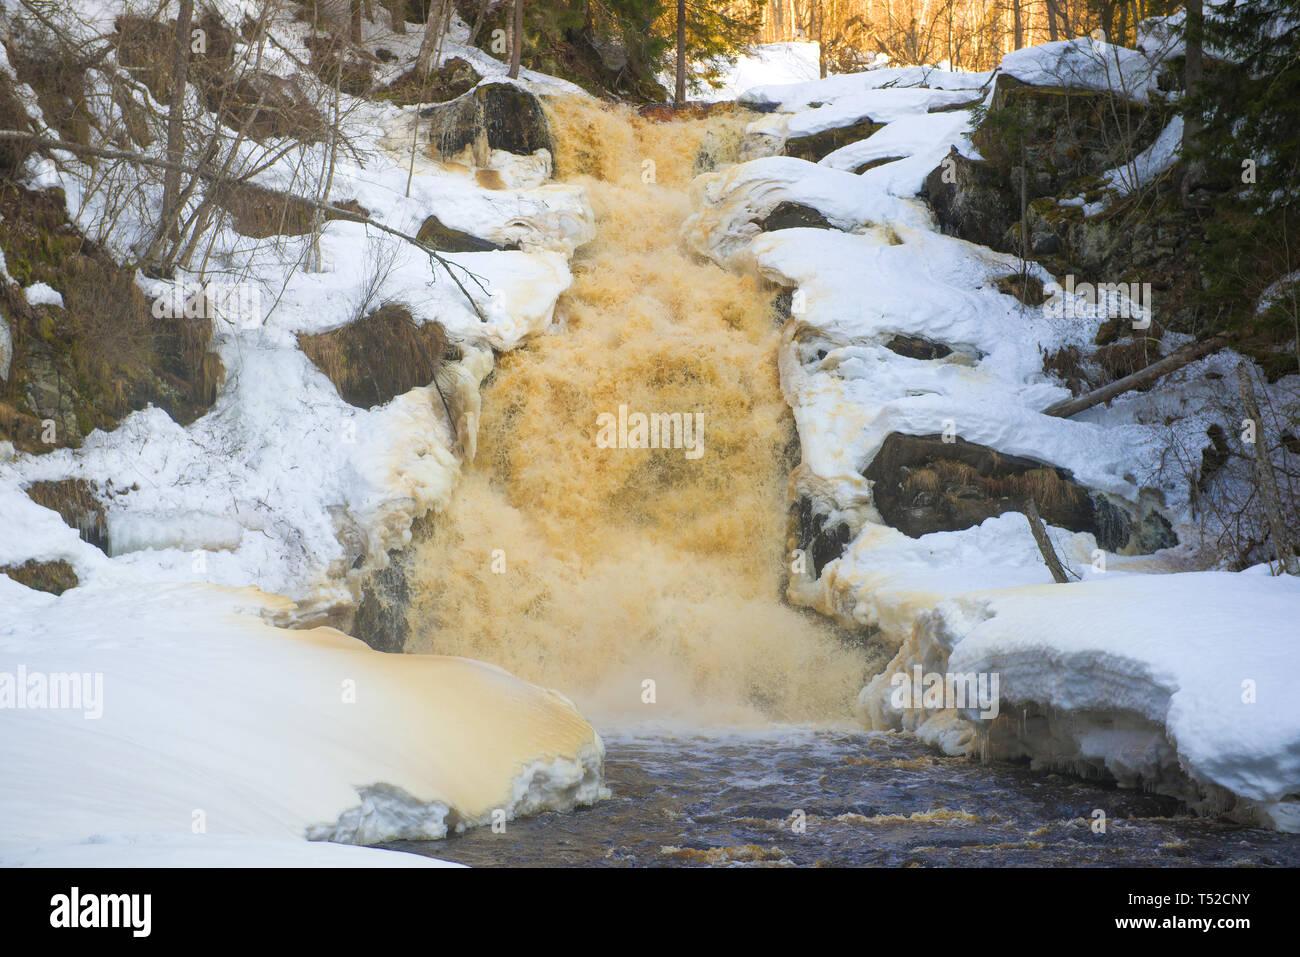 Jukankoski waterfall close up in the April morning. Karelia, Russia - Stock Image